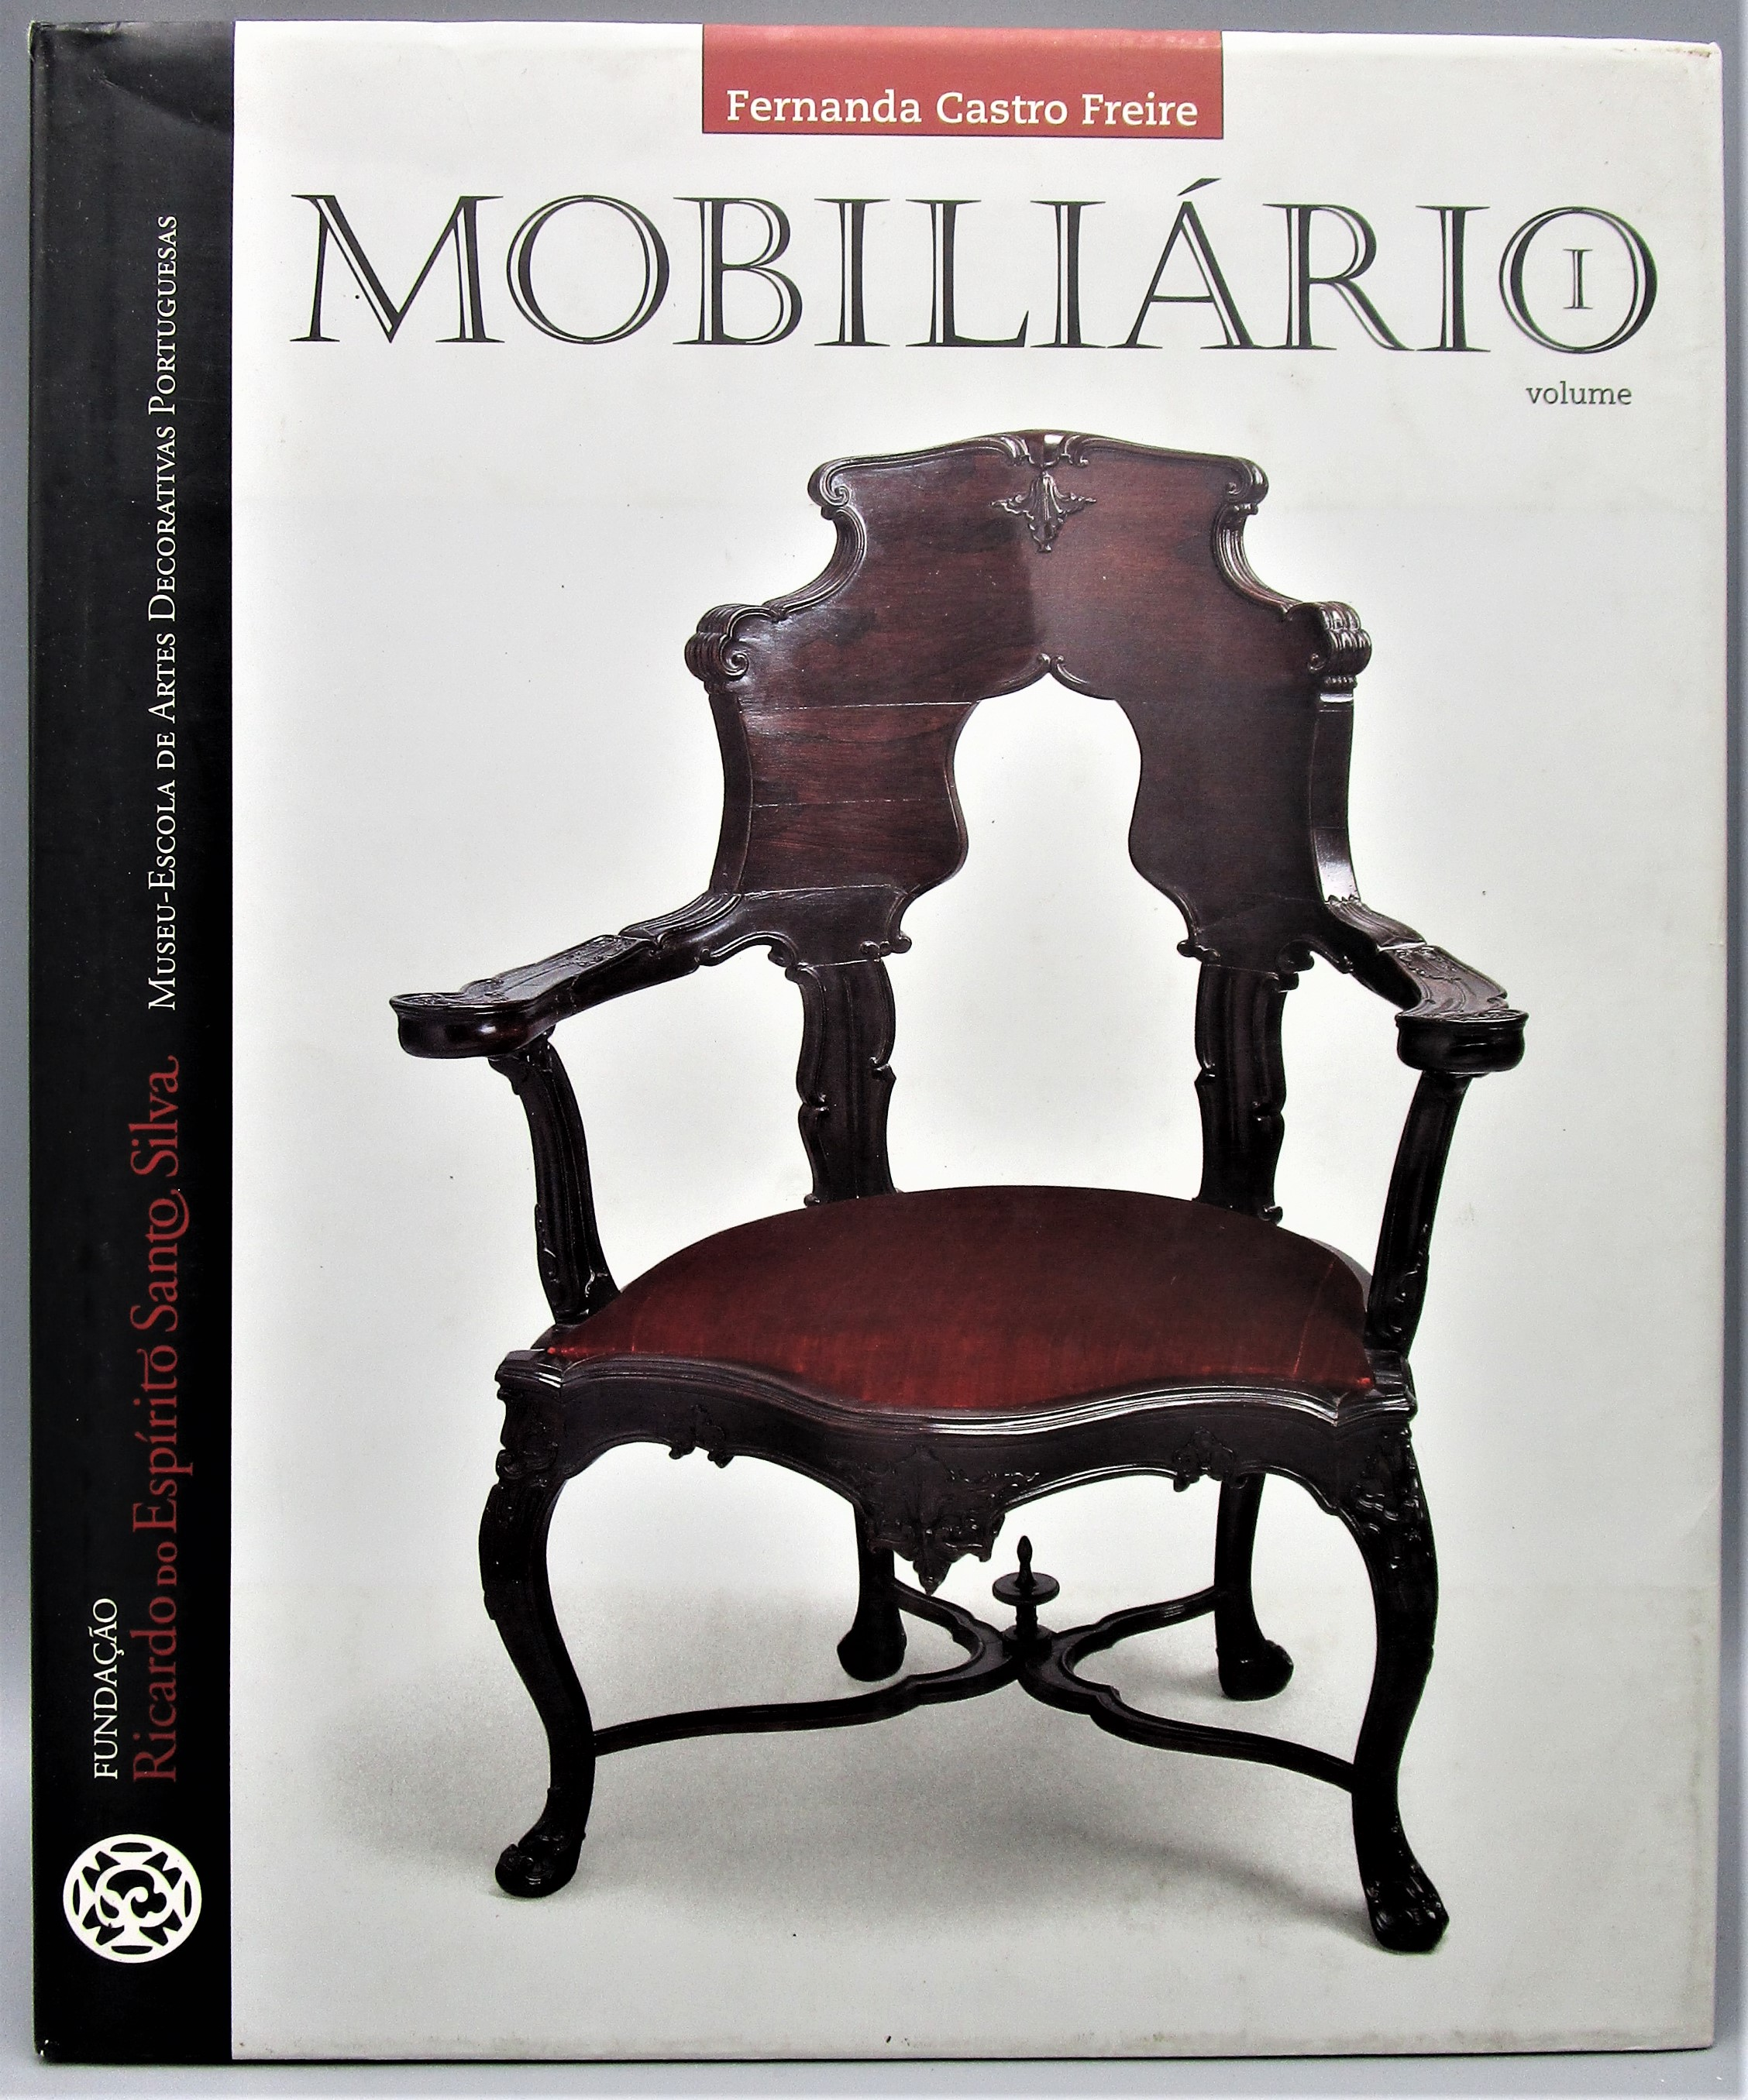 MOBILIARIO, by Fernanda Castro Freire - 2001 [1st Ed Vol 1]